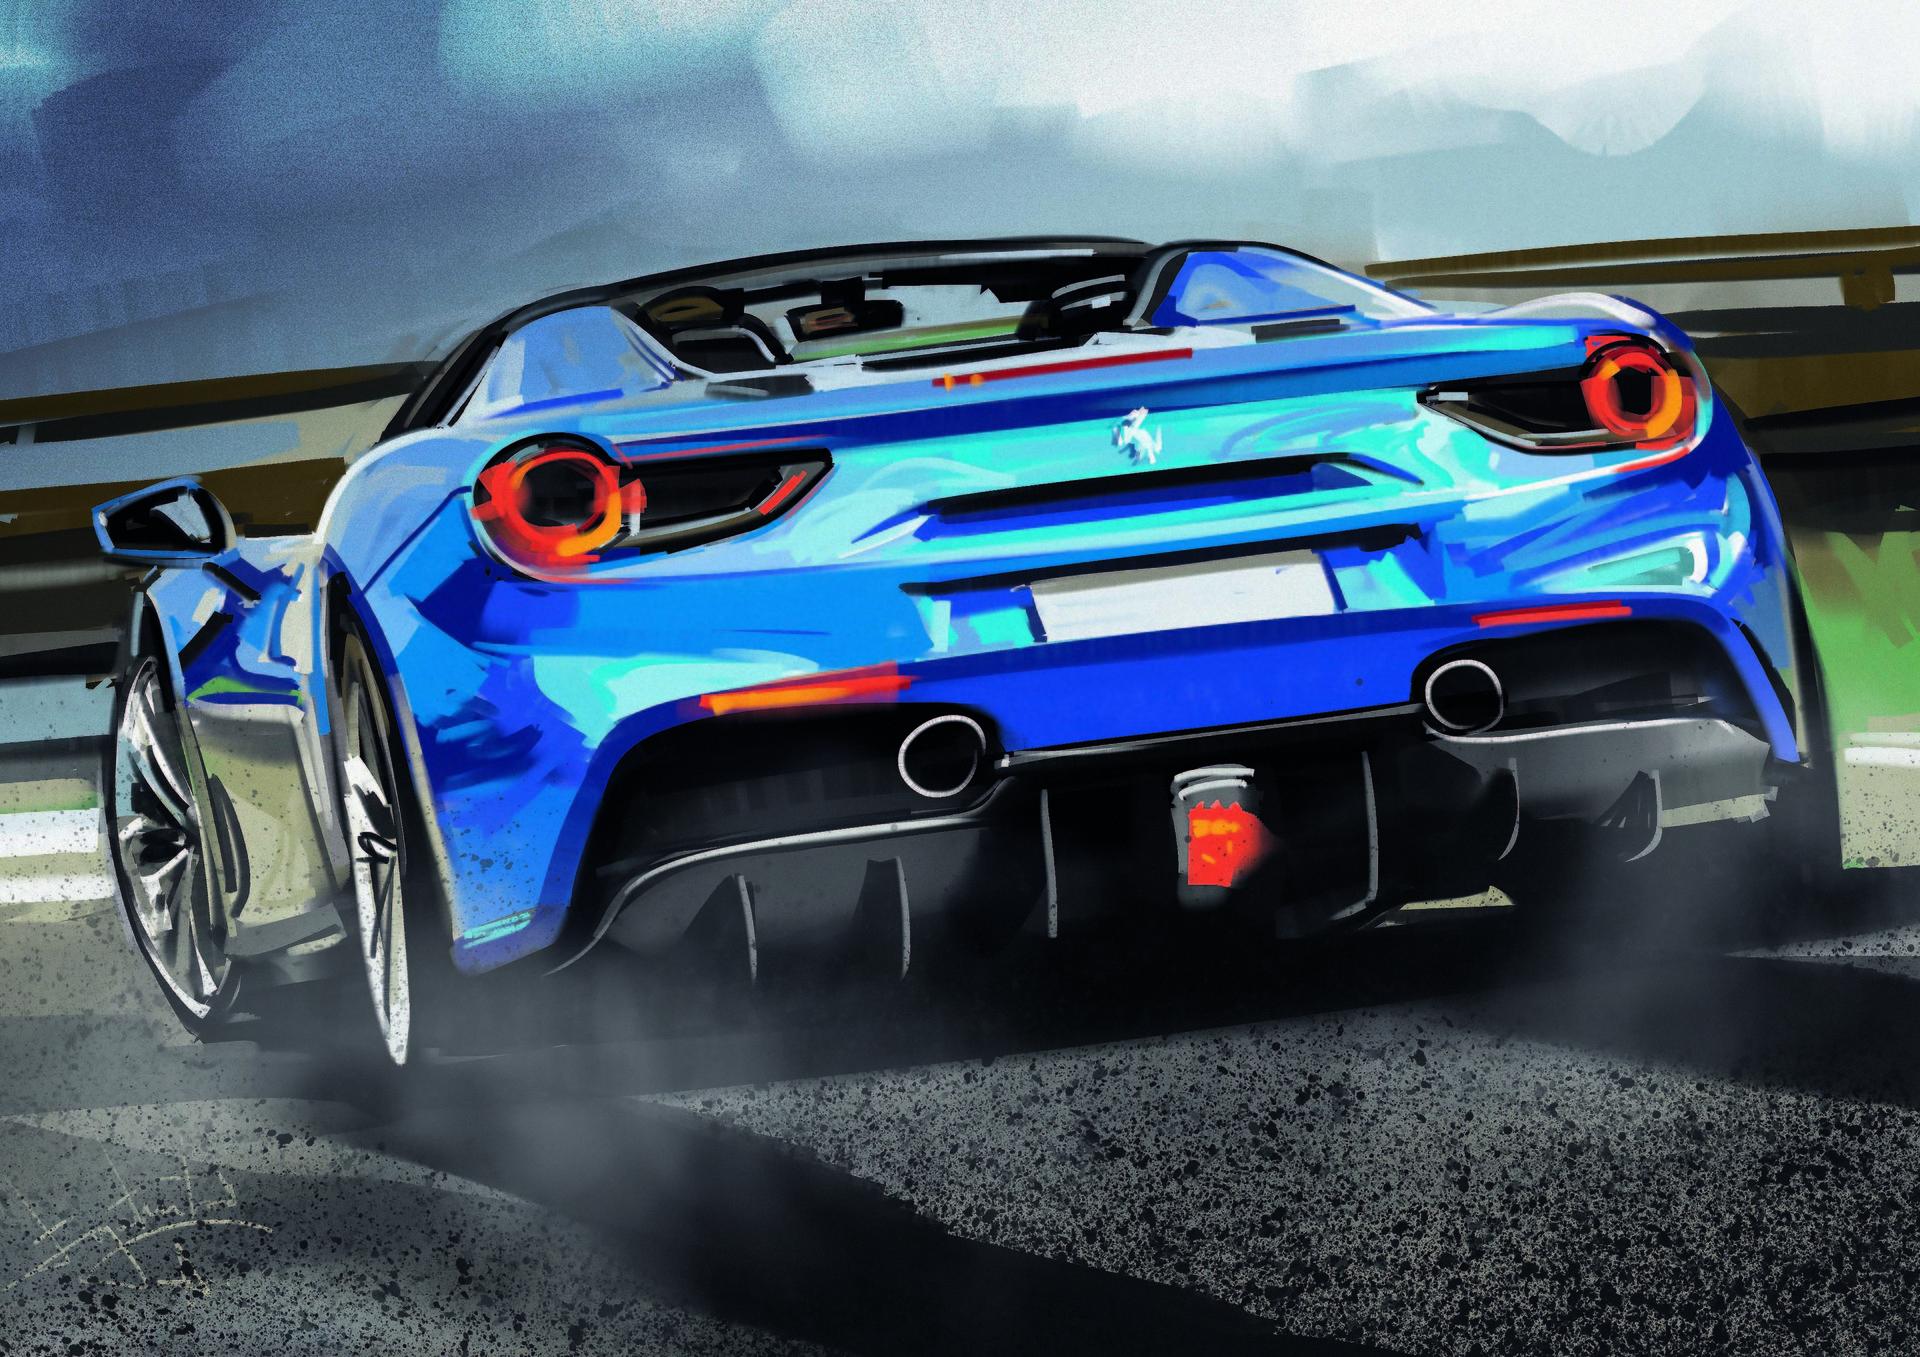 General 1920x1357 Aleksandr Sidelnikov Ferrari blue cars sports car car road sky